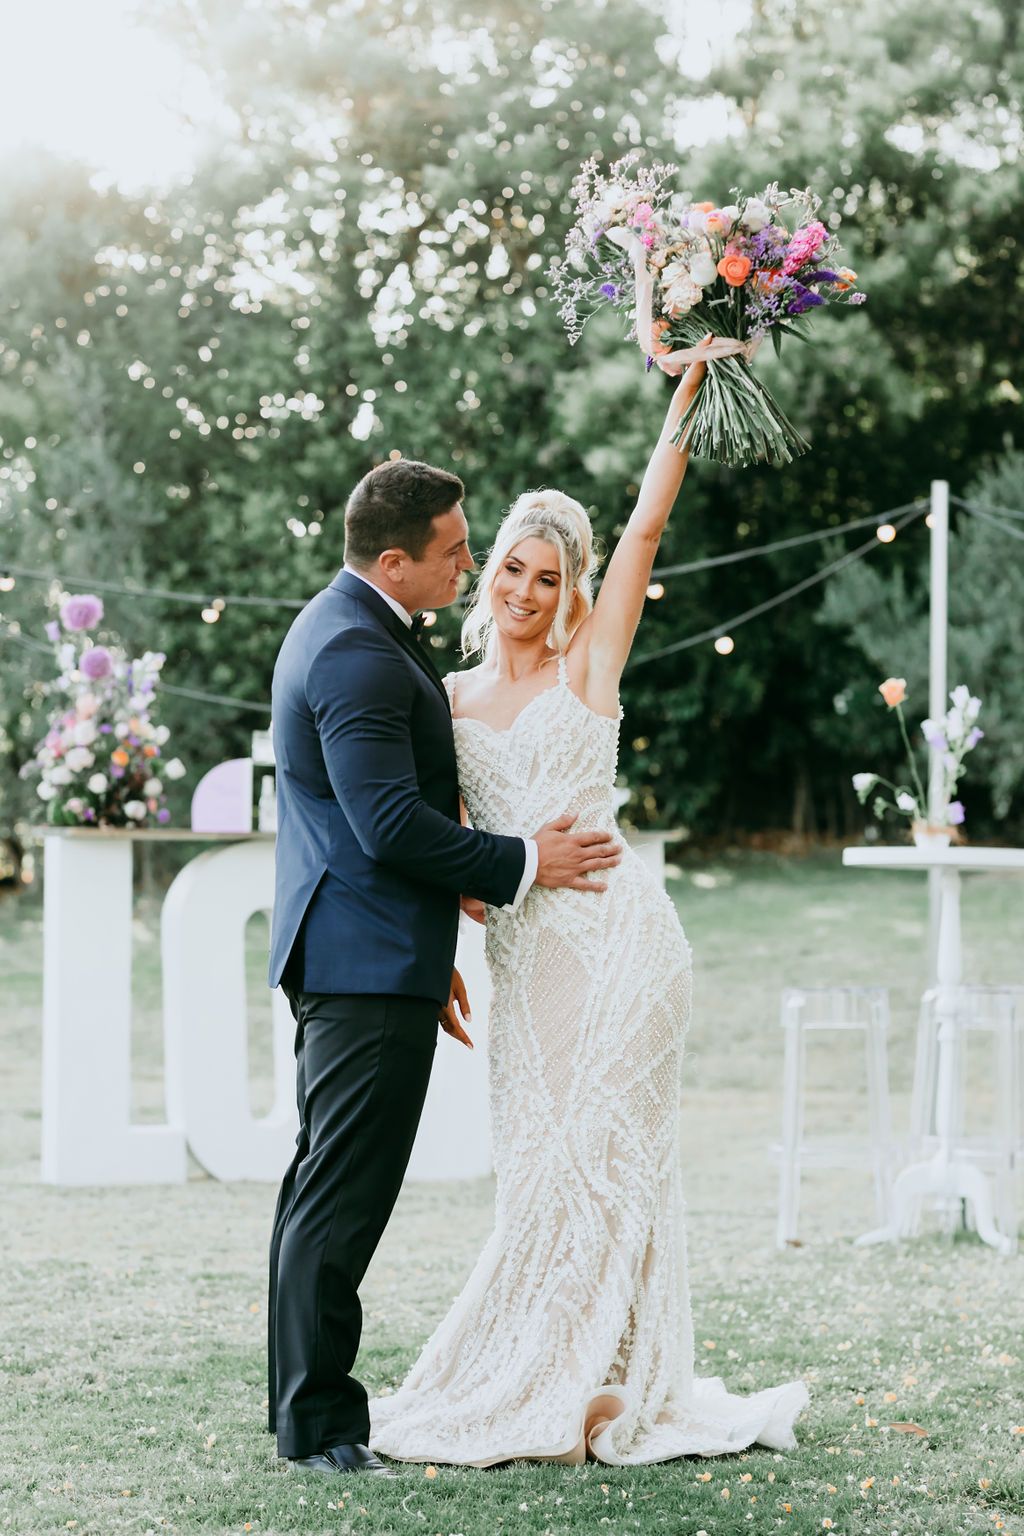 MODERN WHIMSICAL LAVENDER WEDDING STYLING